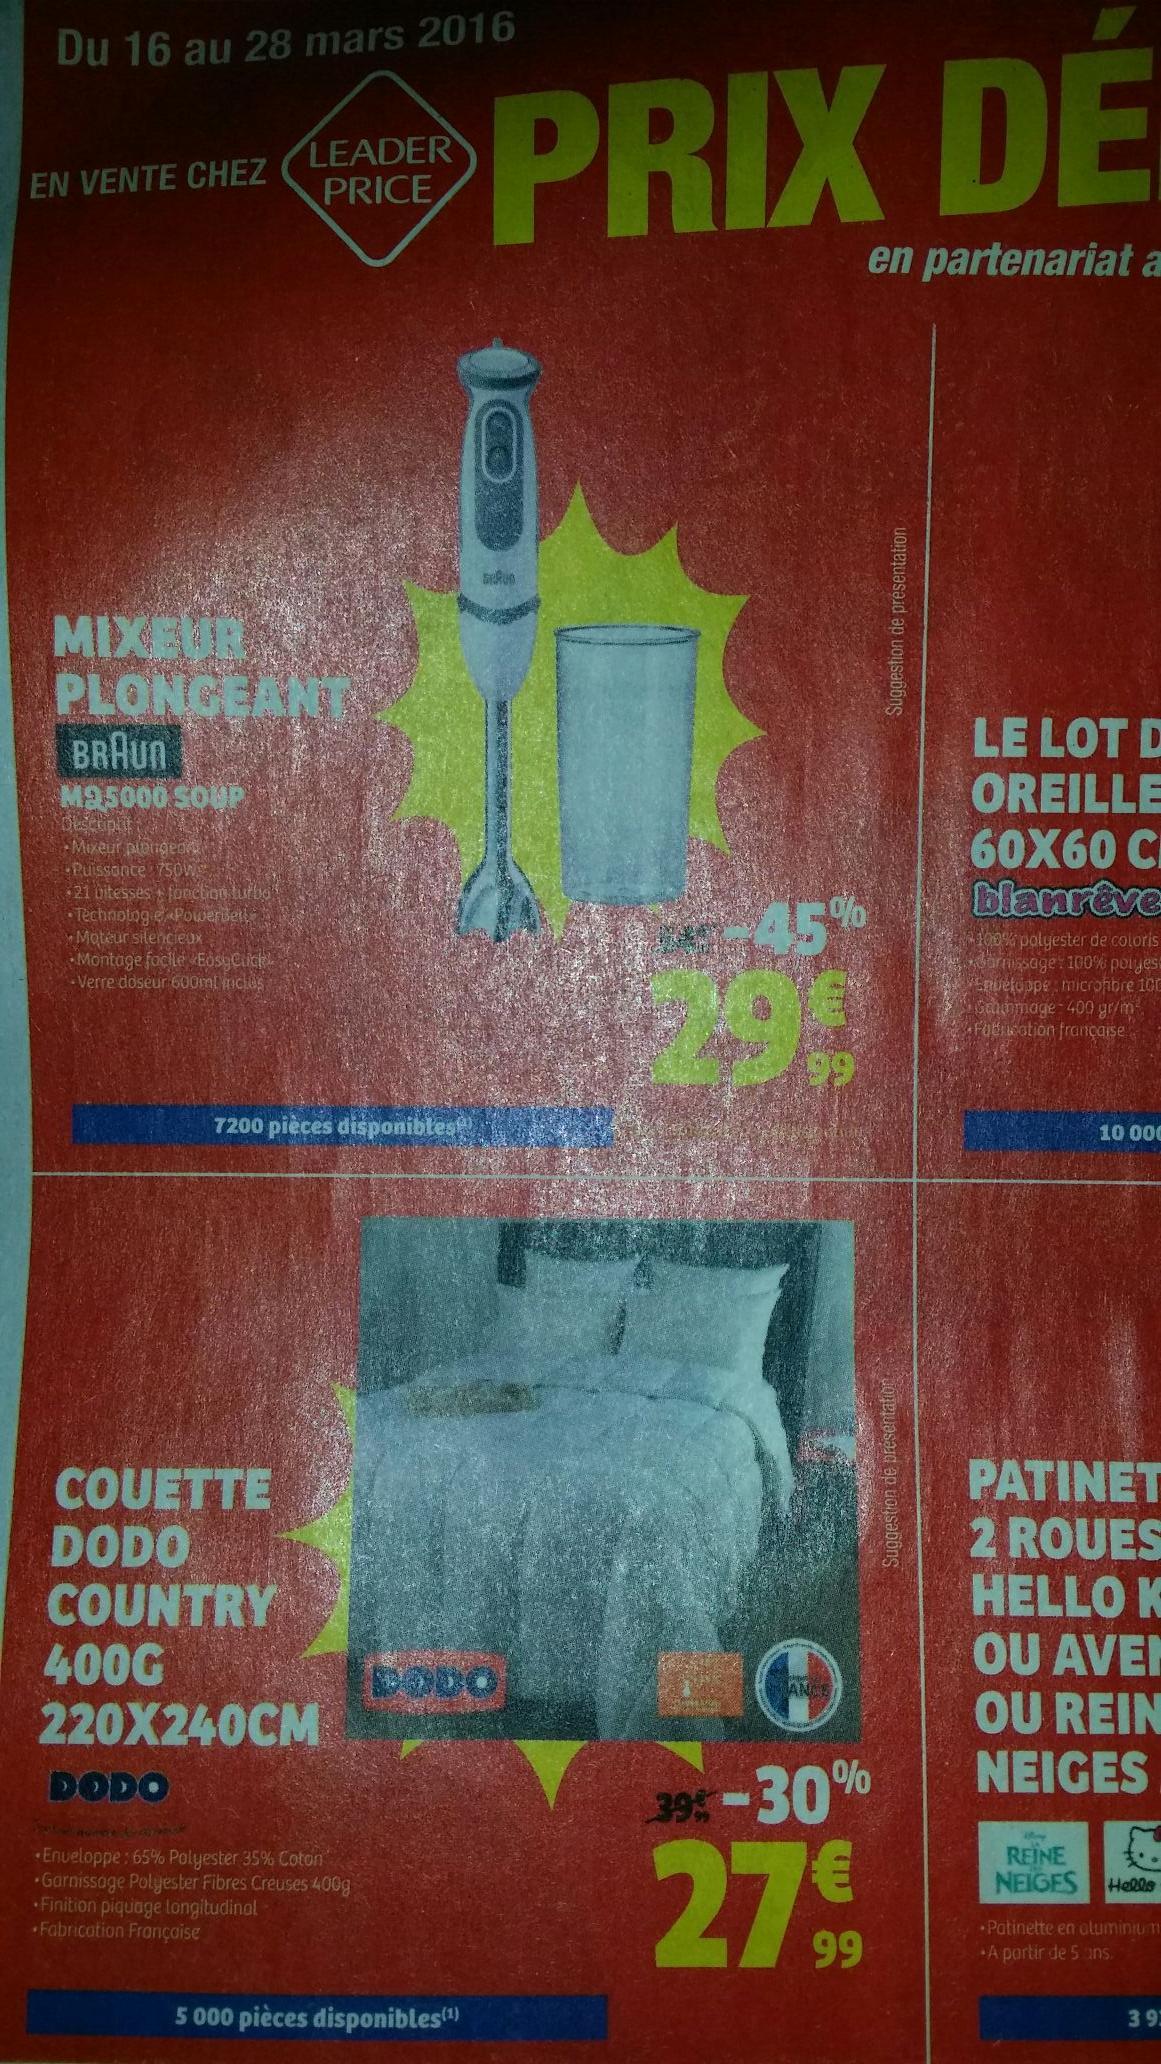 Couette chaude 400Gr/m² 220x240cm Dodo Country